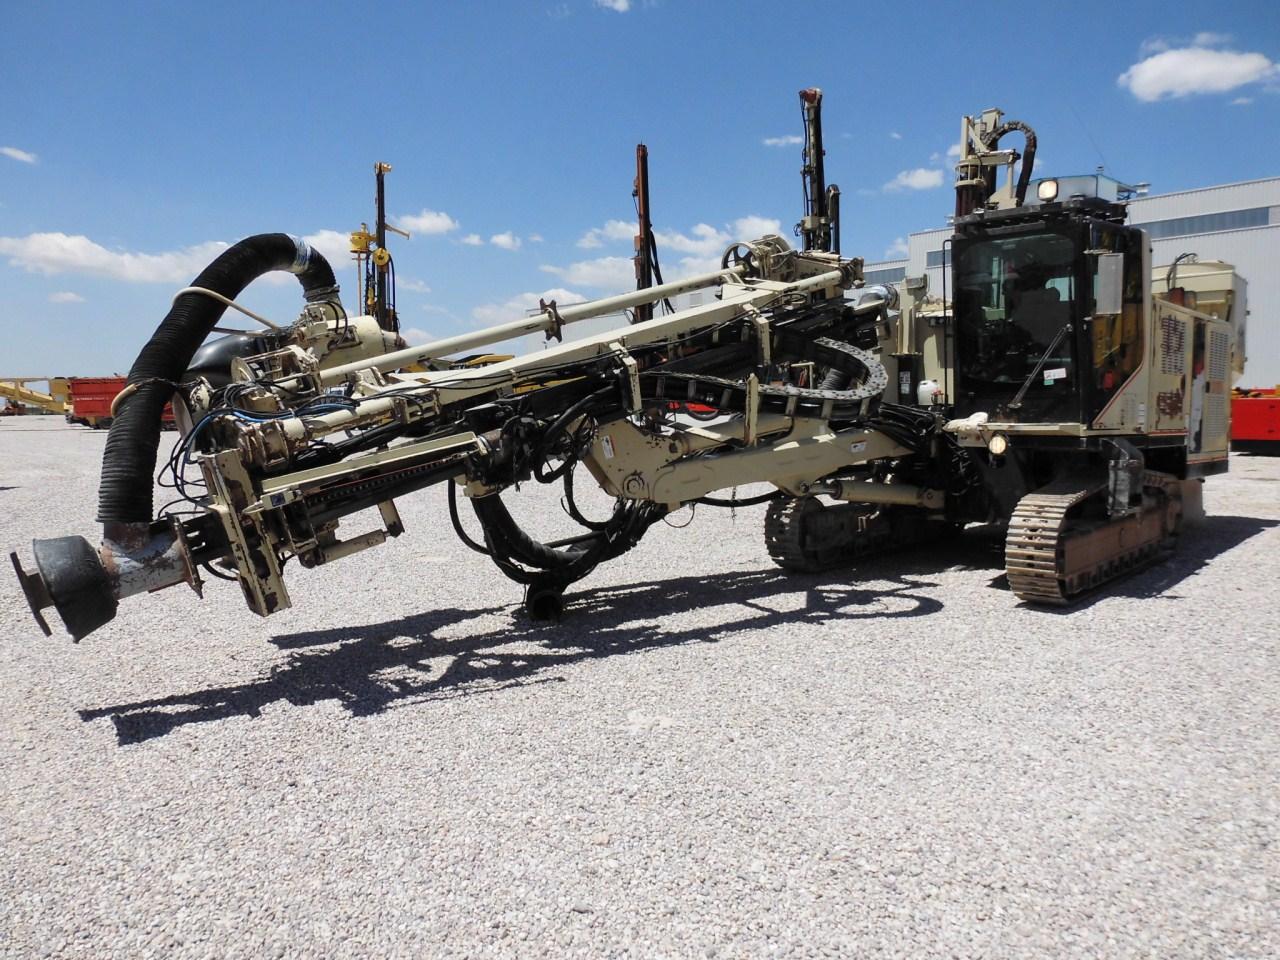 ingersoll-rand-rock-drill-jumbosan-machine-drilling-blasting-spare-parts-drifter-4.jpg